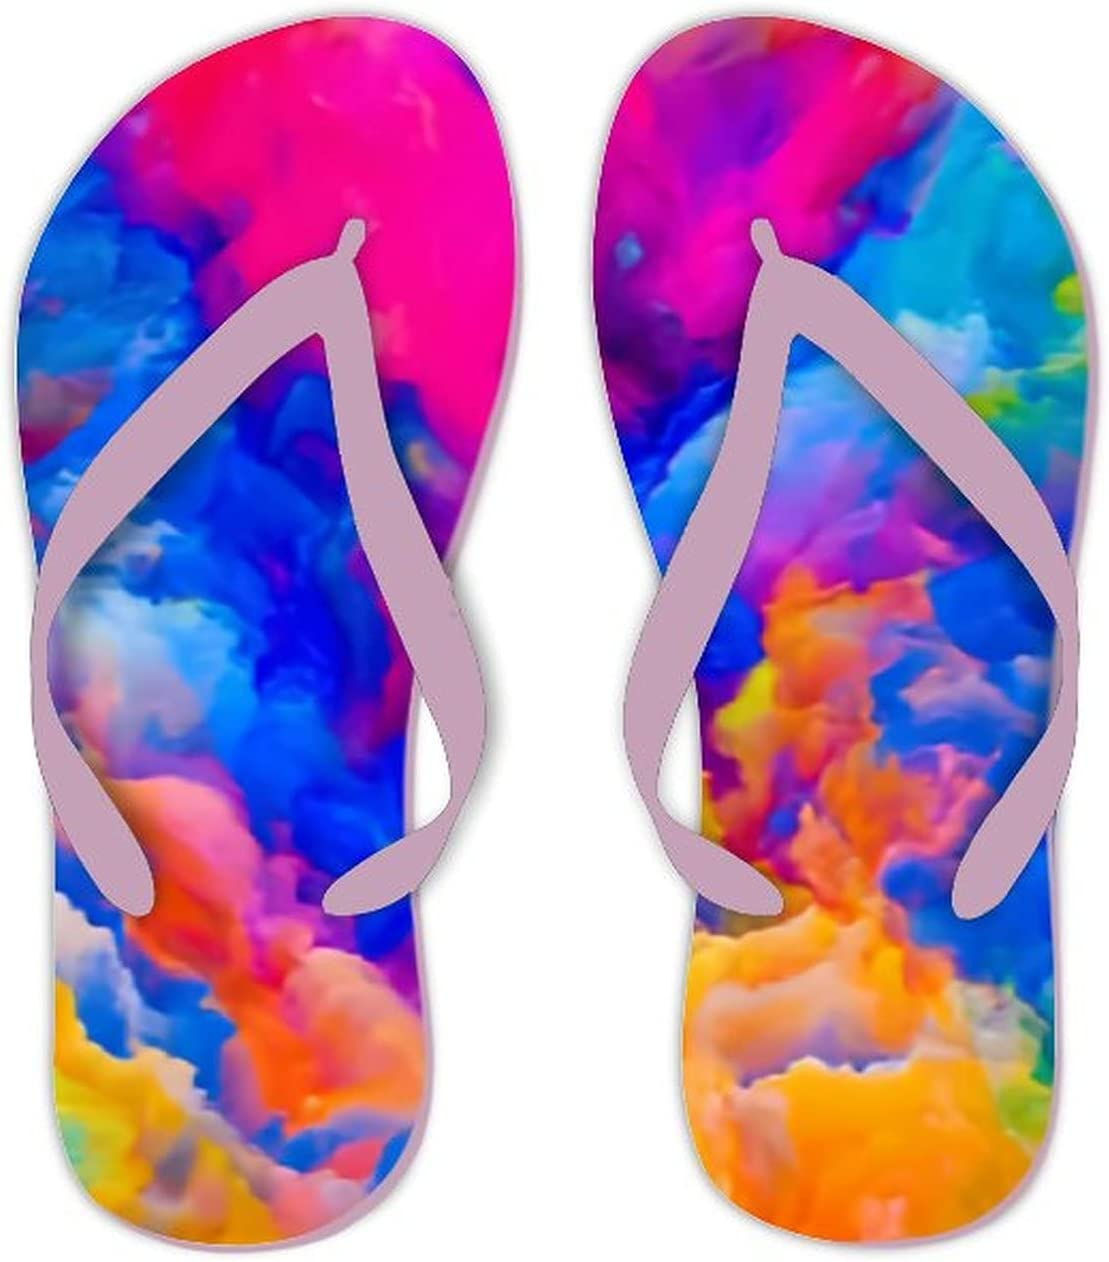 UTF4C Summer Flip Flops for Men Women Colors Imagination Series Backdrop Colorful Soft Lightweight Non Slip Sandals for Shower Beach Pool Bathroom Flat 12.5